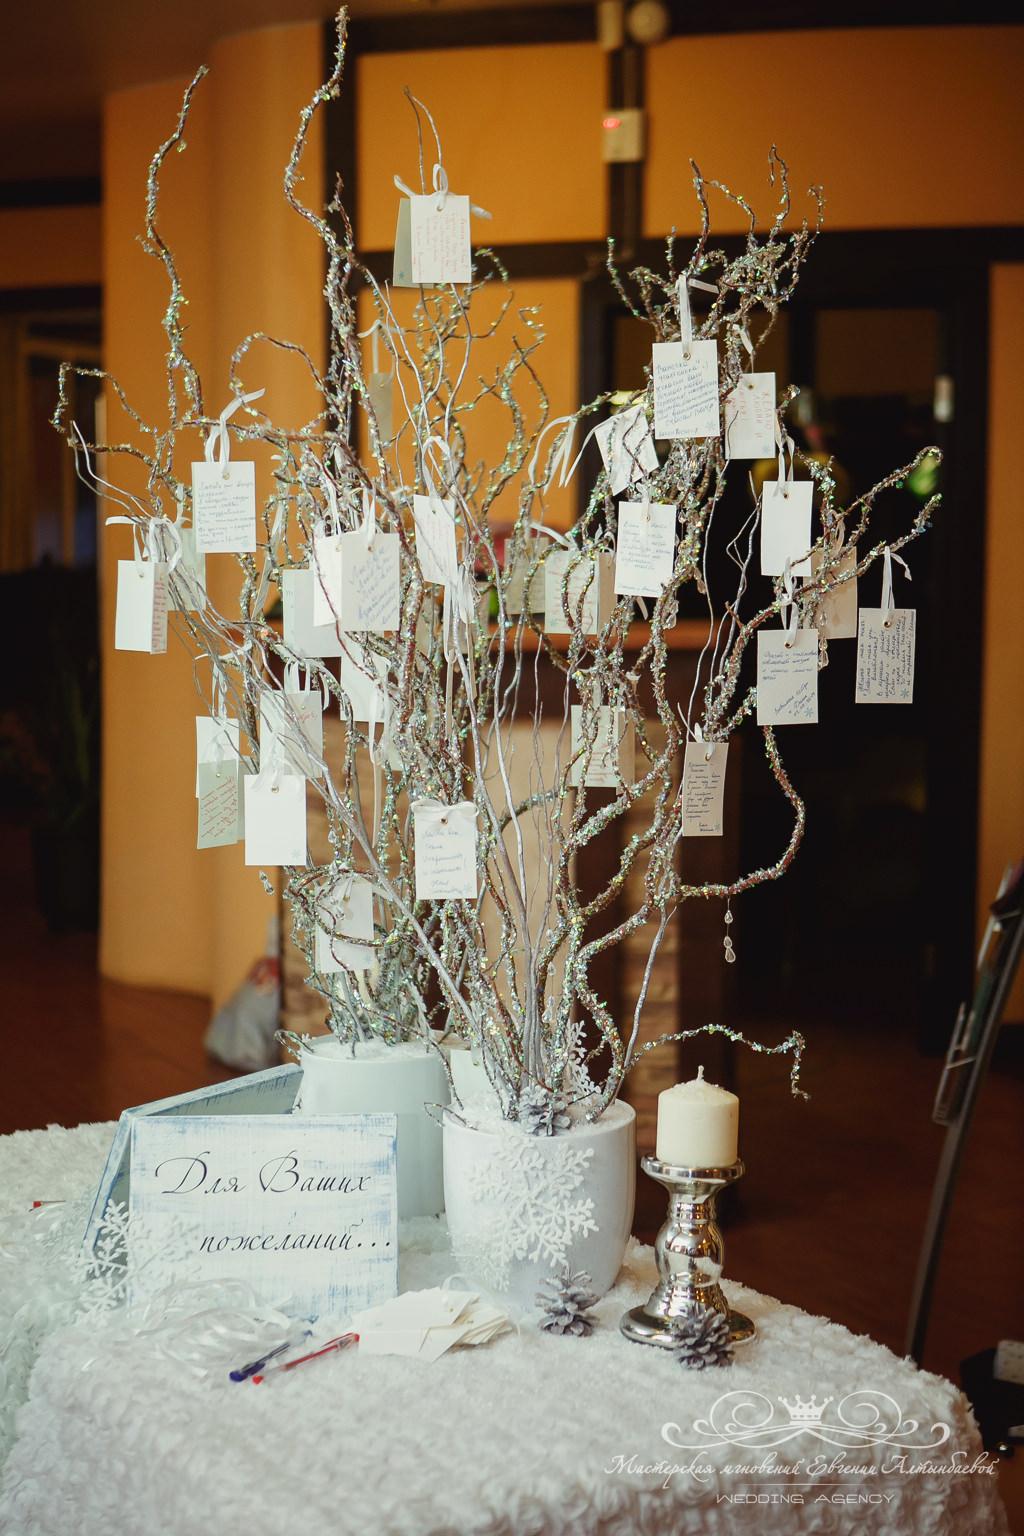 Дерево пожеланий на зимней свадьбе